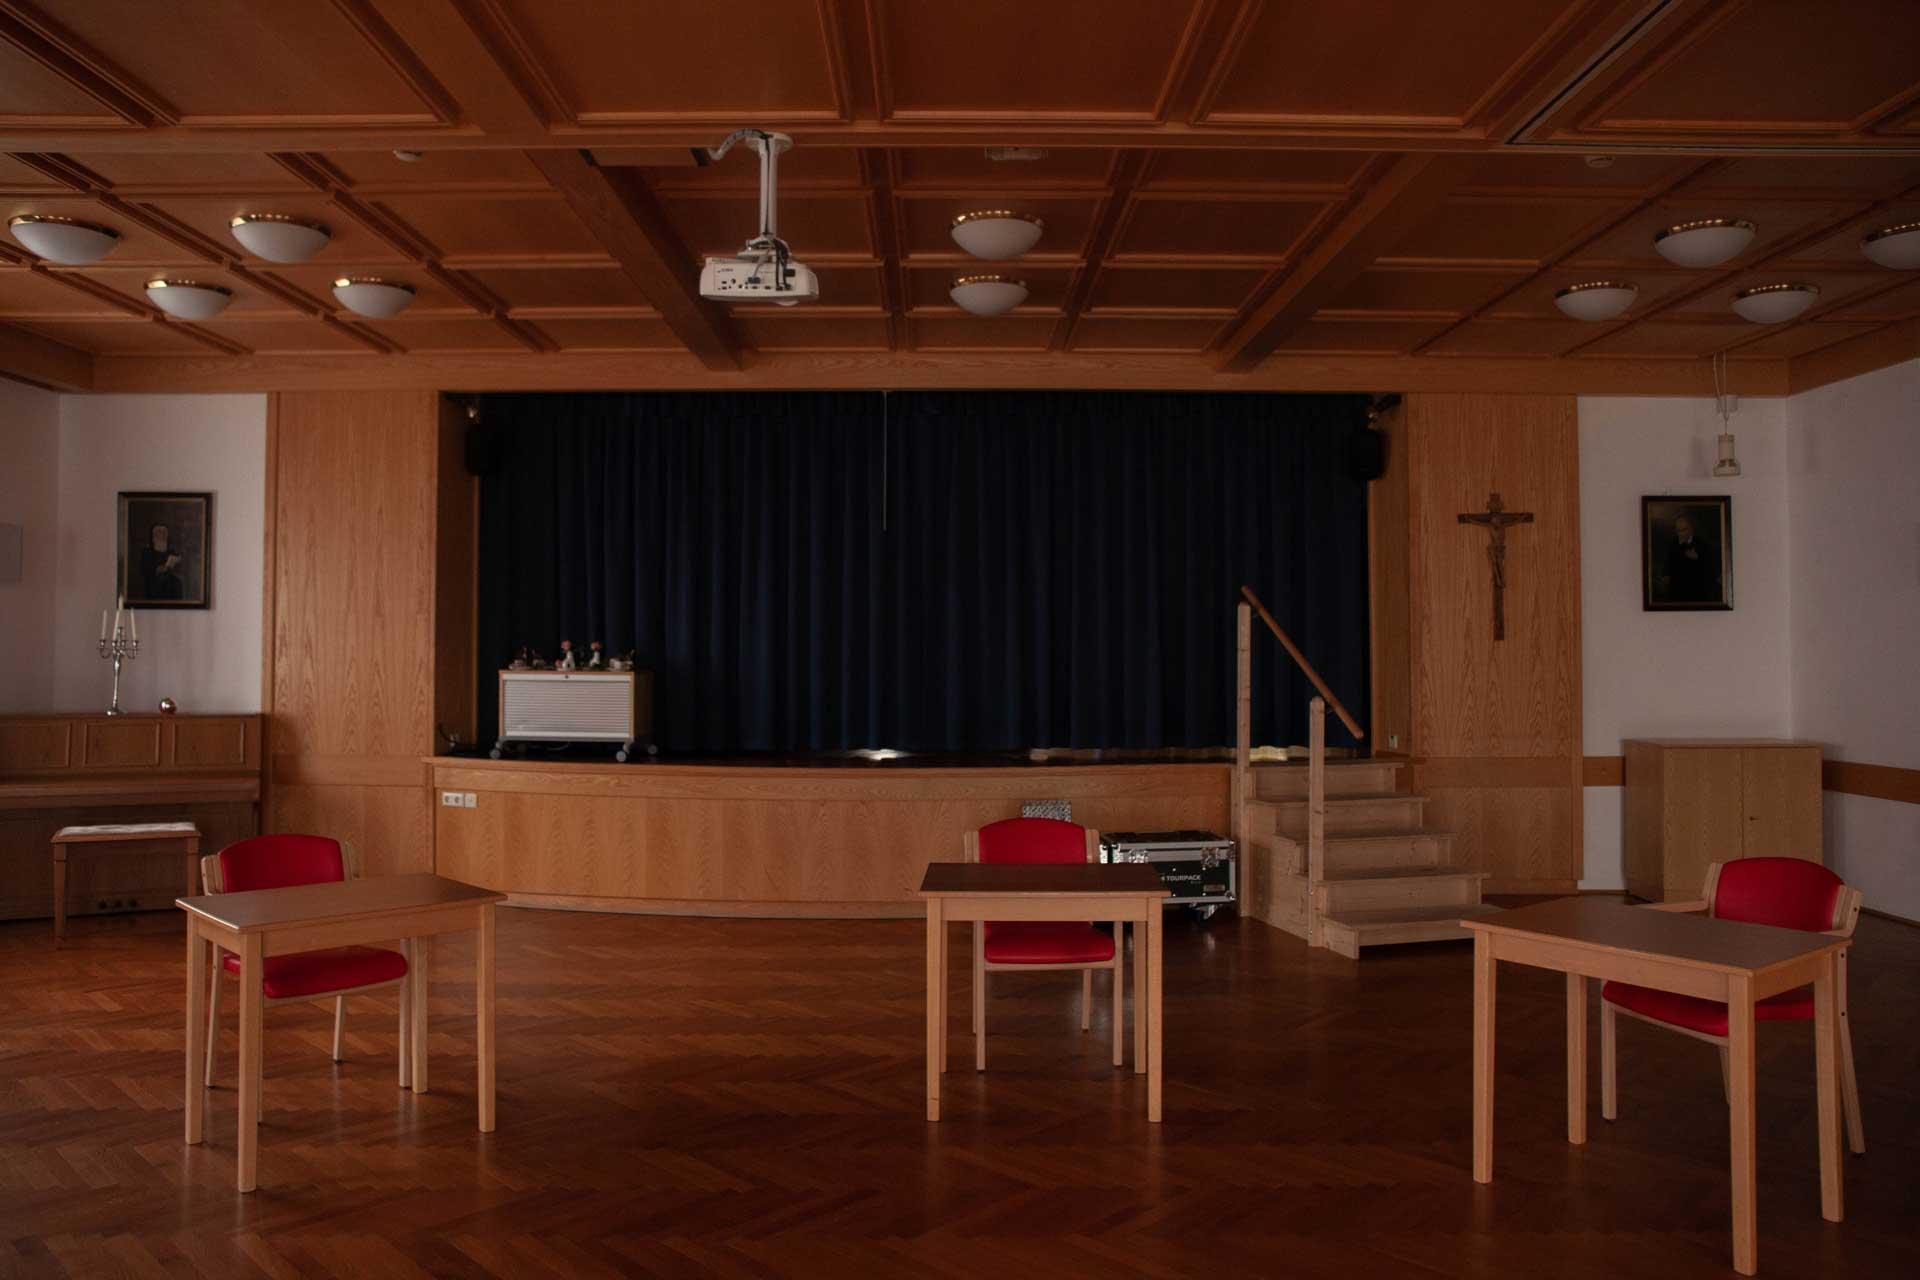 Festsaal im Herz Jesu Heim